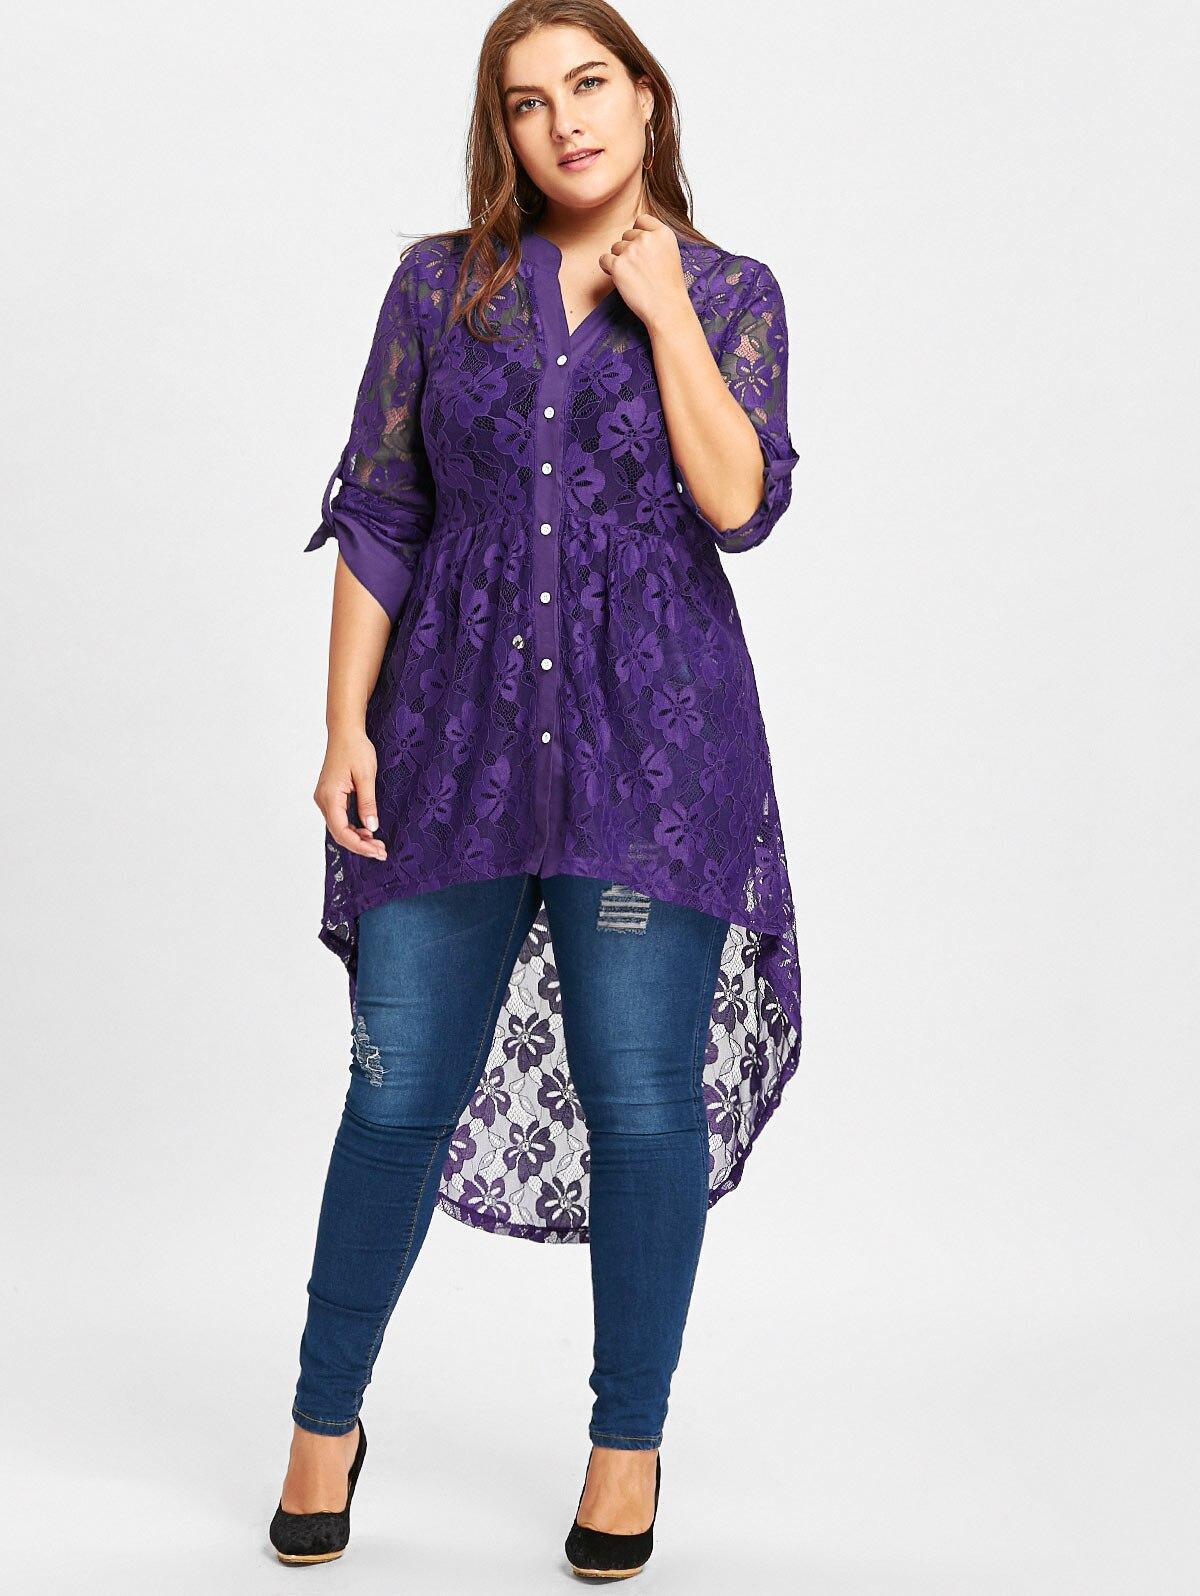 92fbf9d699 Compre ZAFUL Mulheres Primavera Plus Size Blusa De Renda Das ...